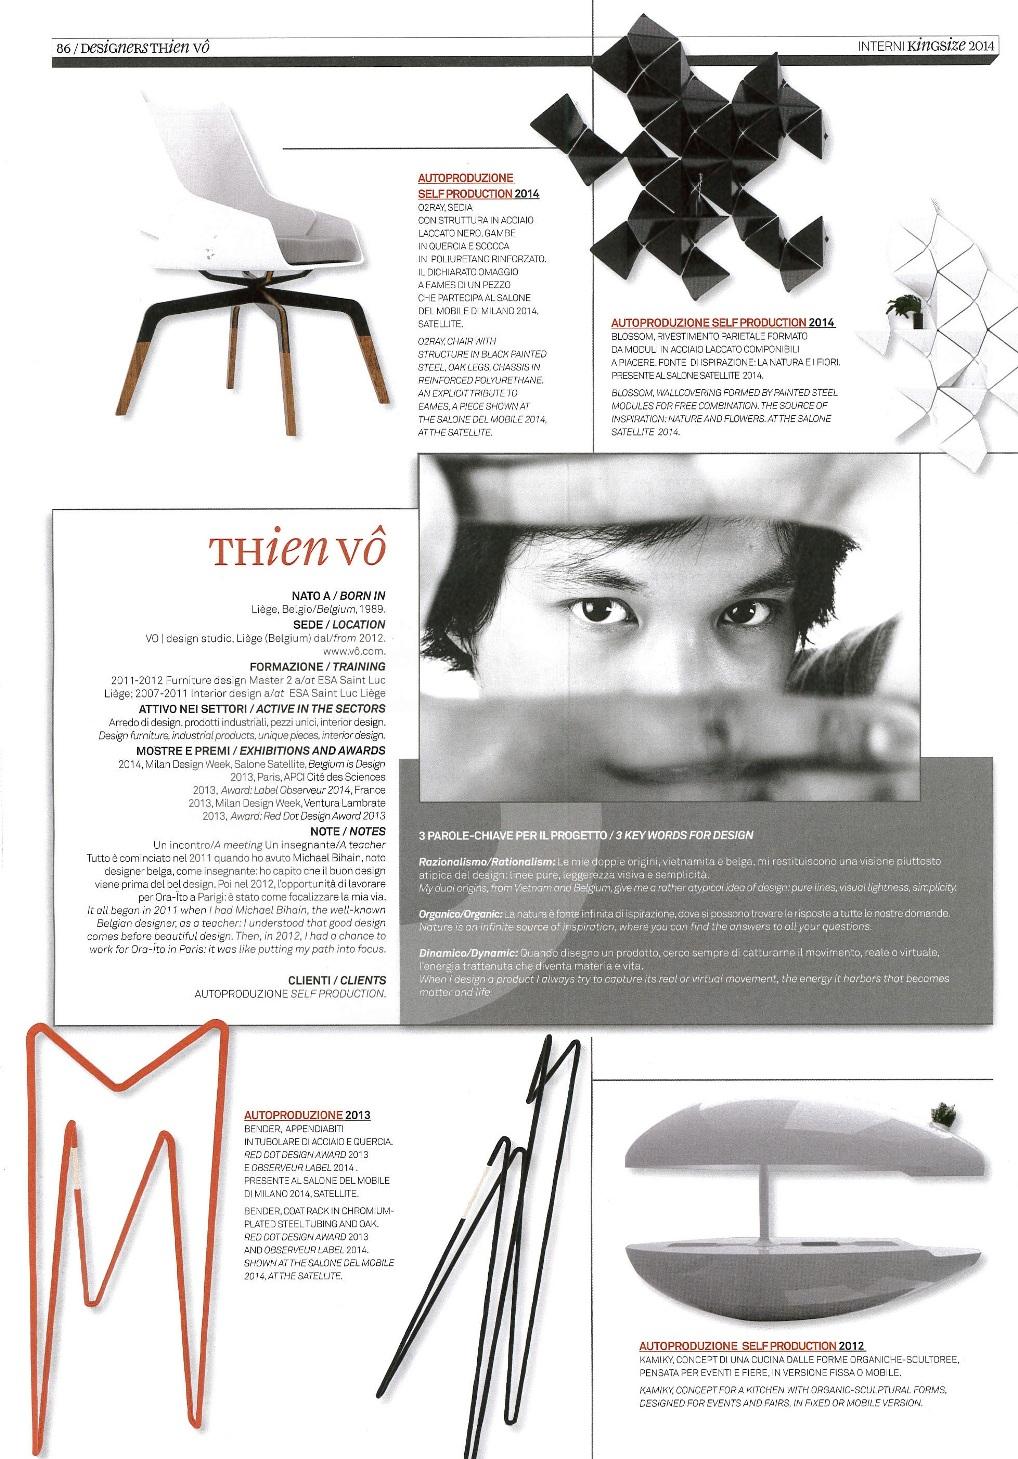 dedece interni young designers salone 2014 (11)